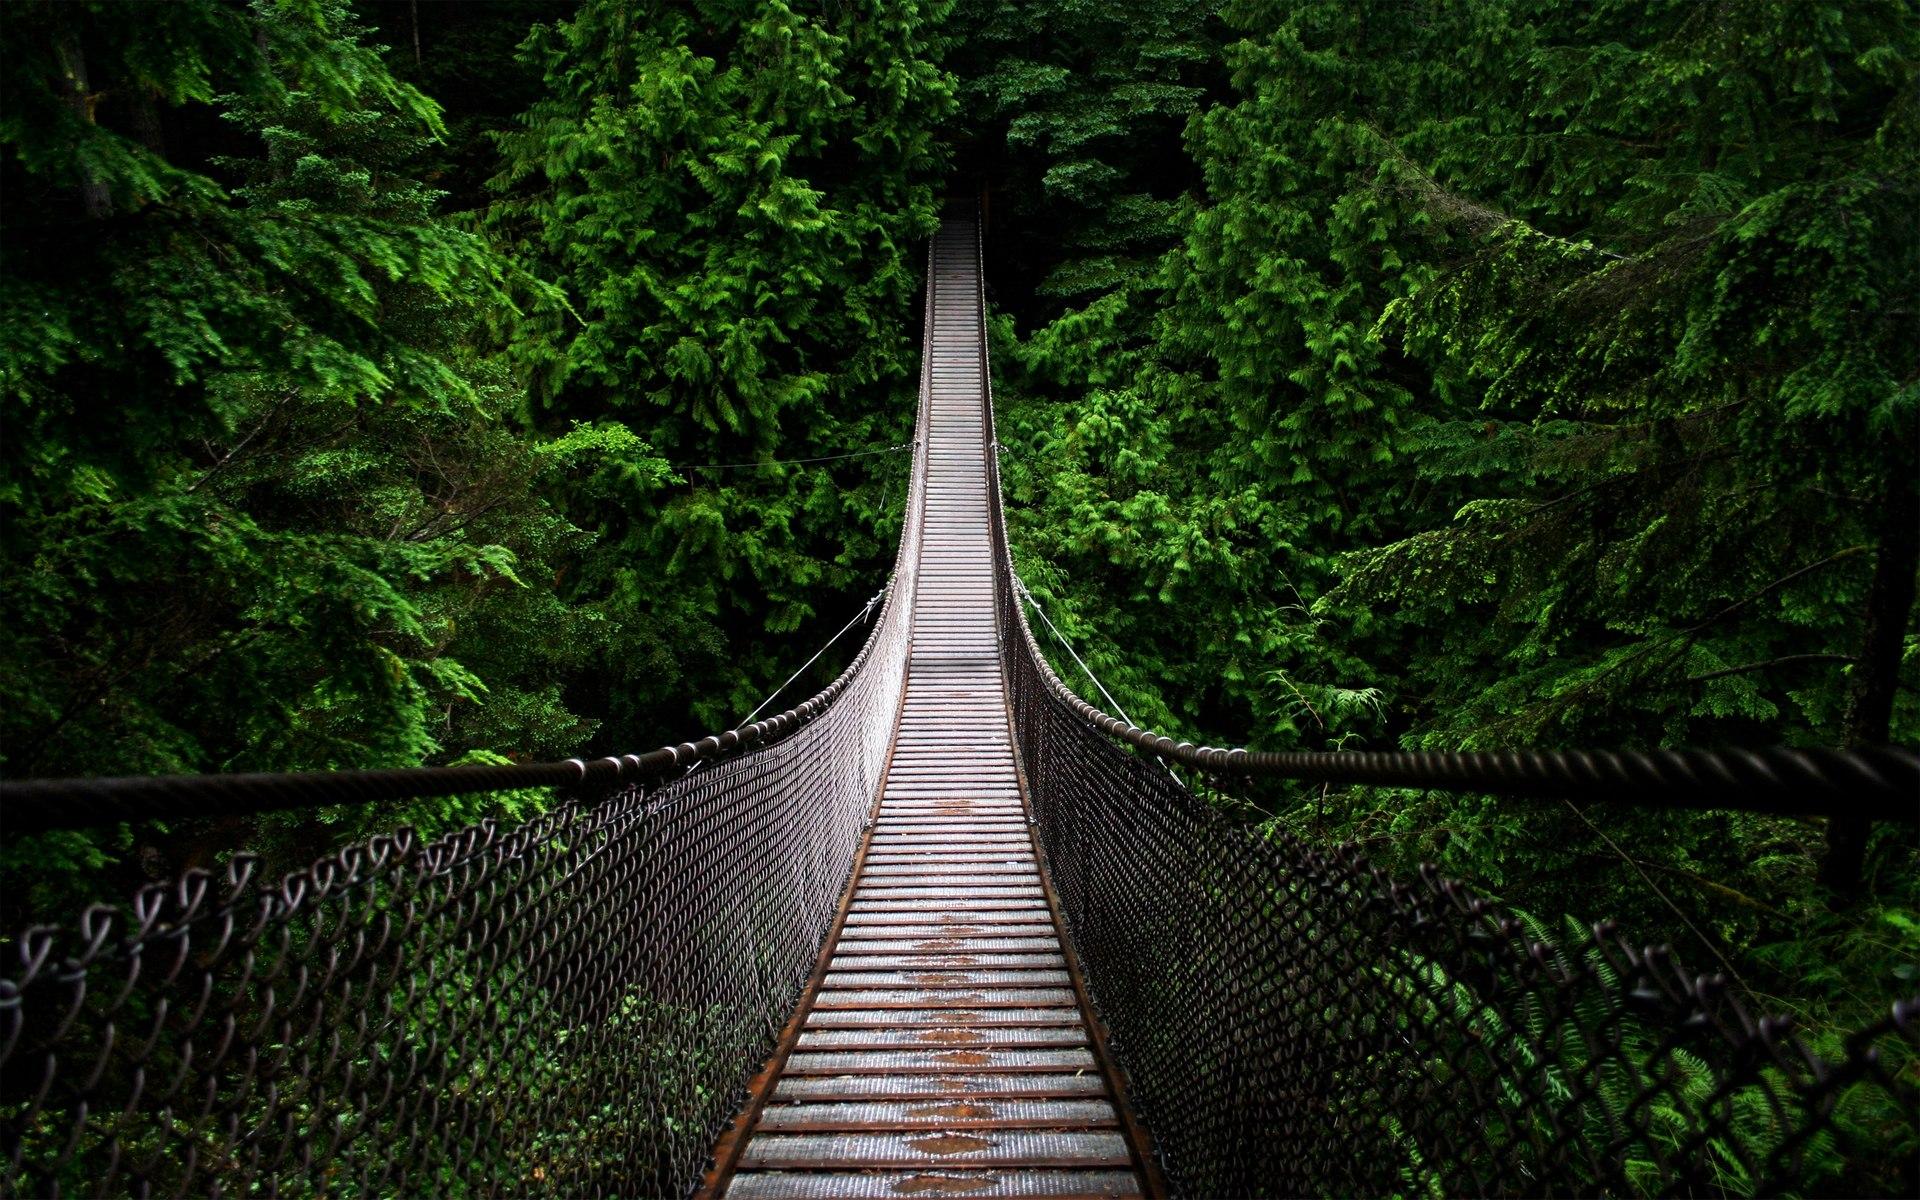 Nature Trees Forest Bridge North 1920x1200